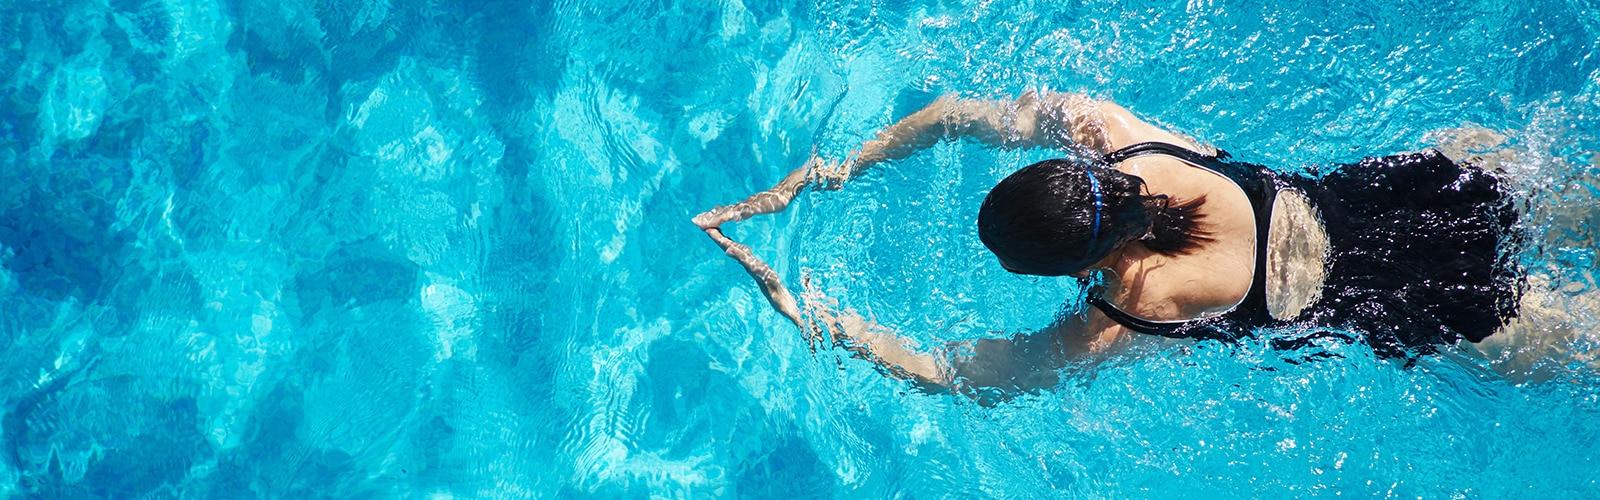 Eine Frau schwimmt in einem Swimmingpool